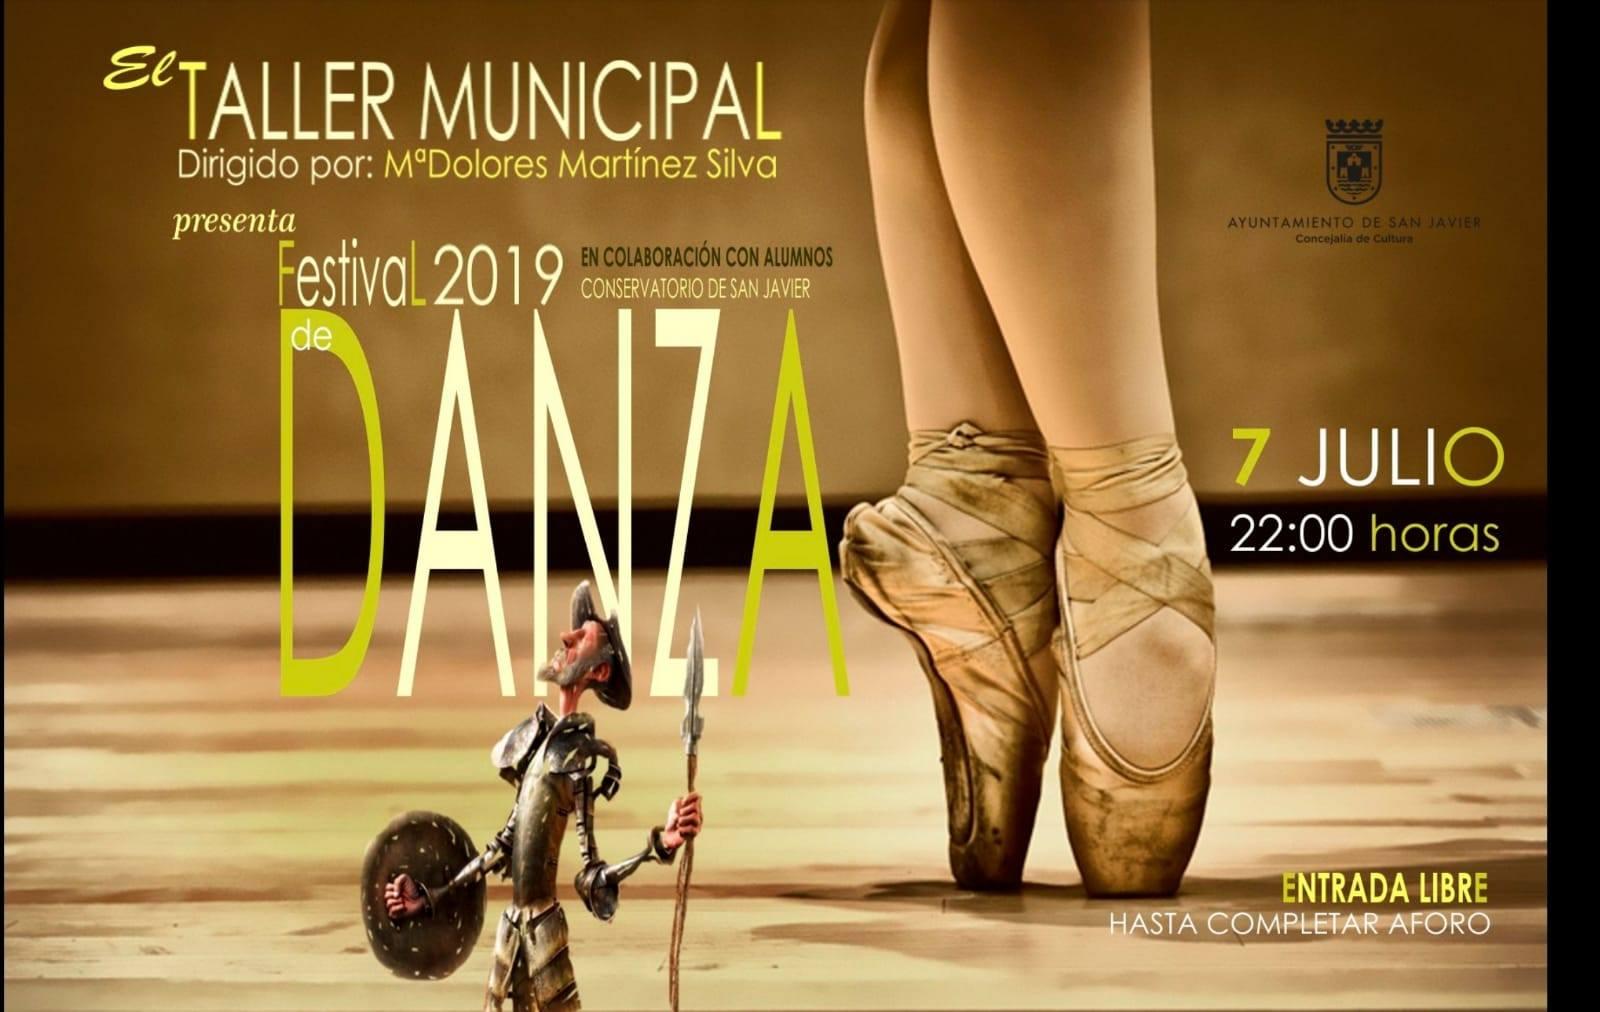 cartel del festival de la danza